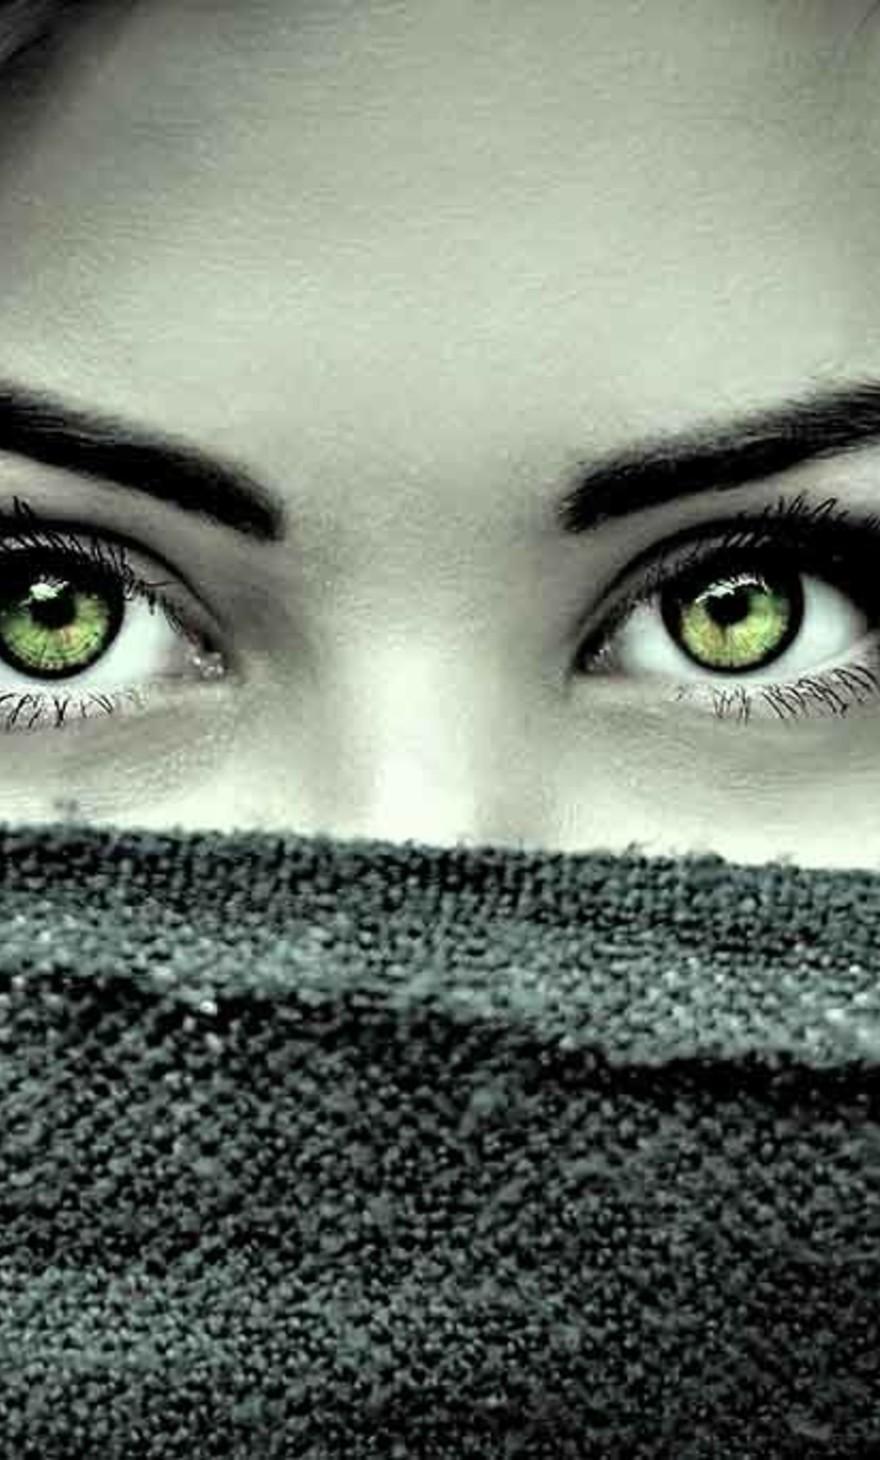 Mysterious eyes